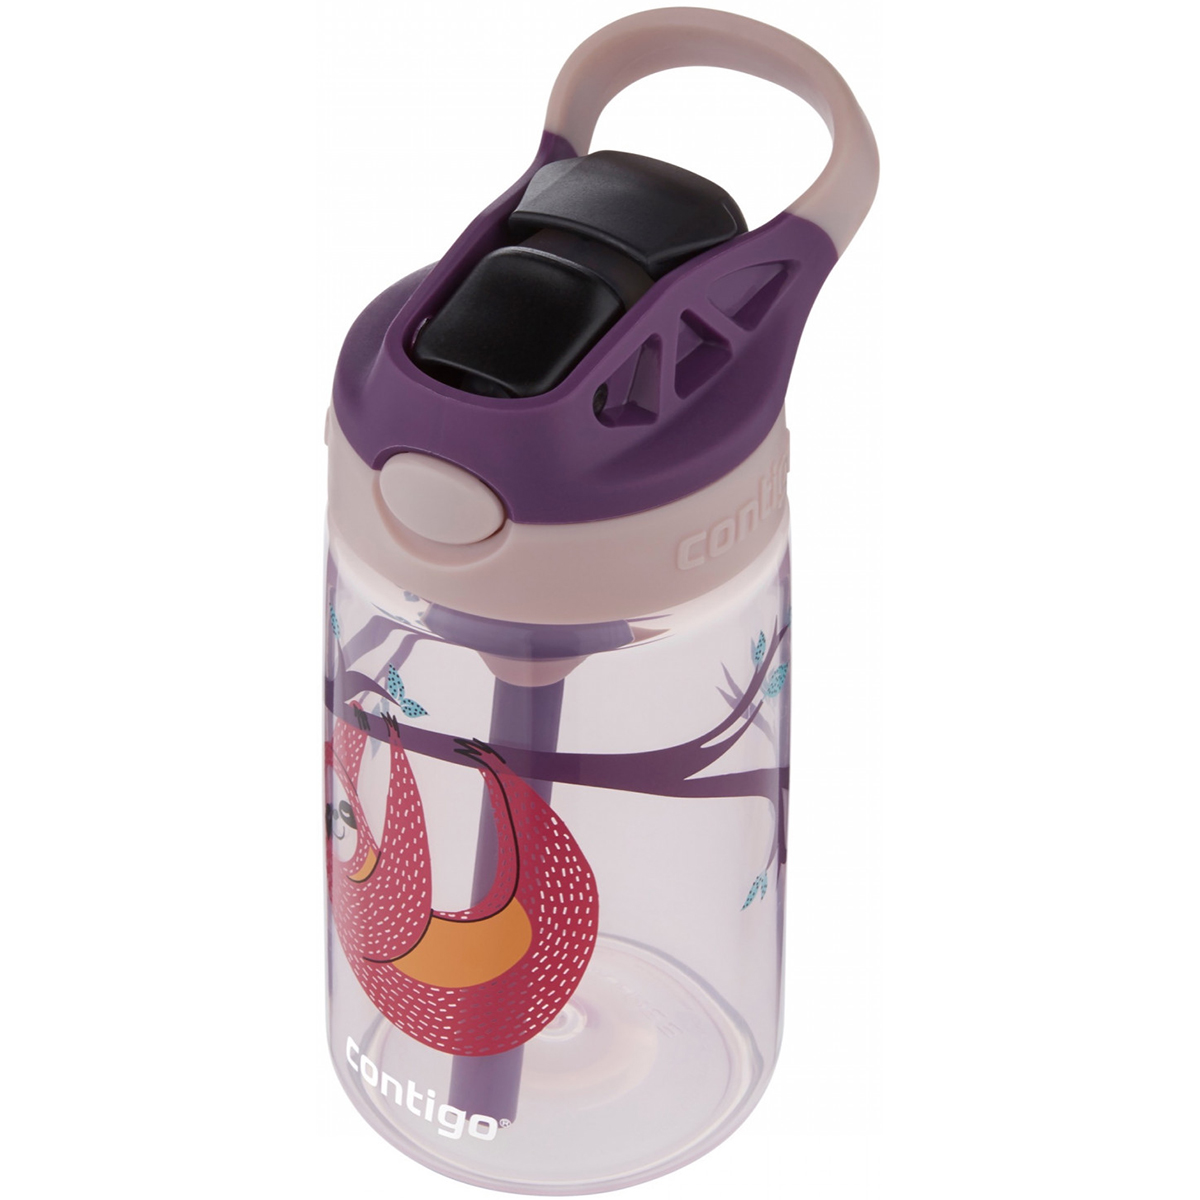 Contigo-Kid-039-s-14-oz-AutoSpout-Straw-Water-Bottle-with-Easy-Clean-Lid thumbnail 36